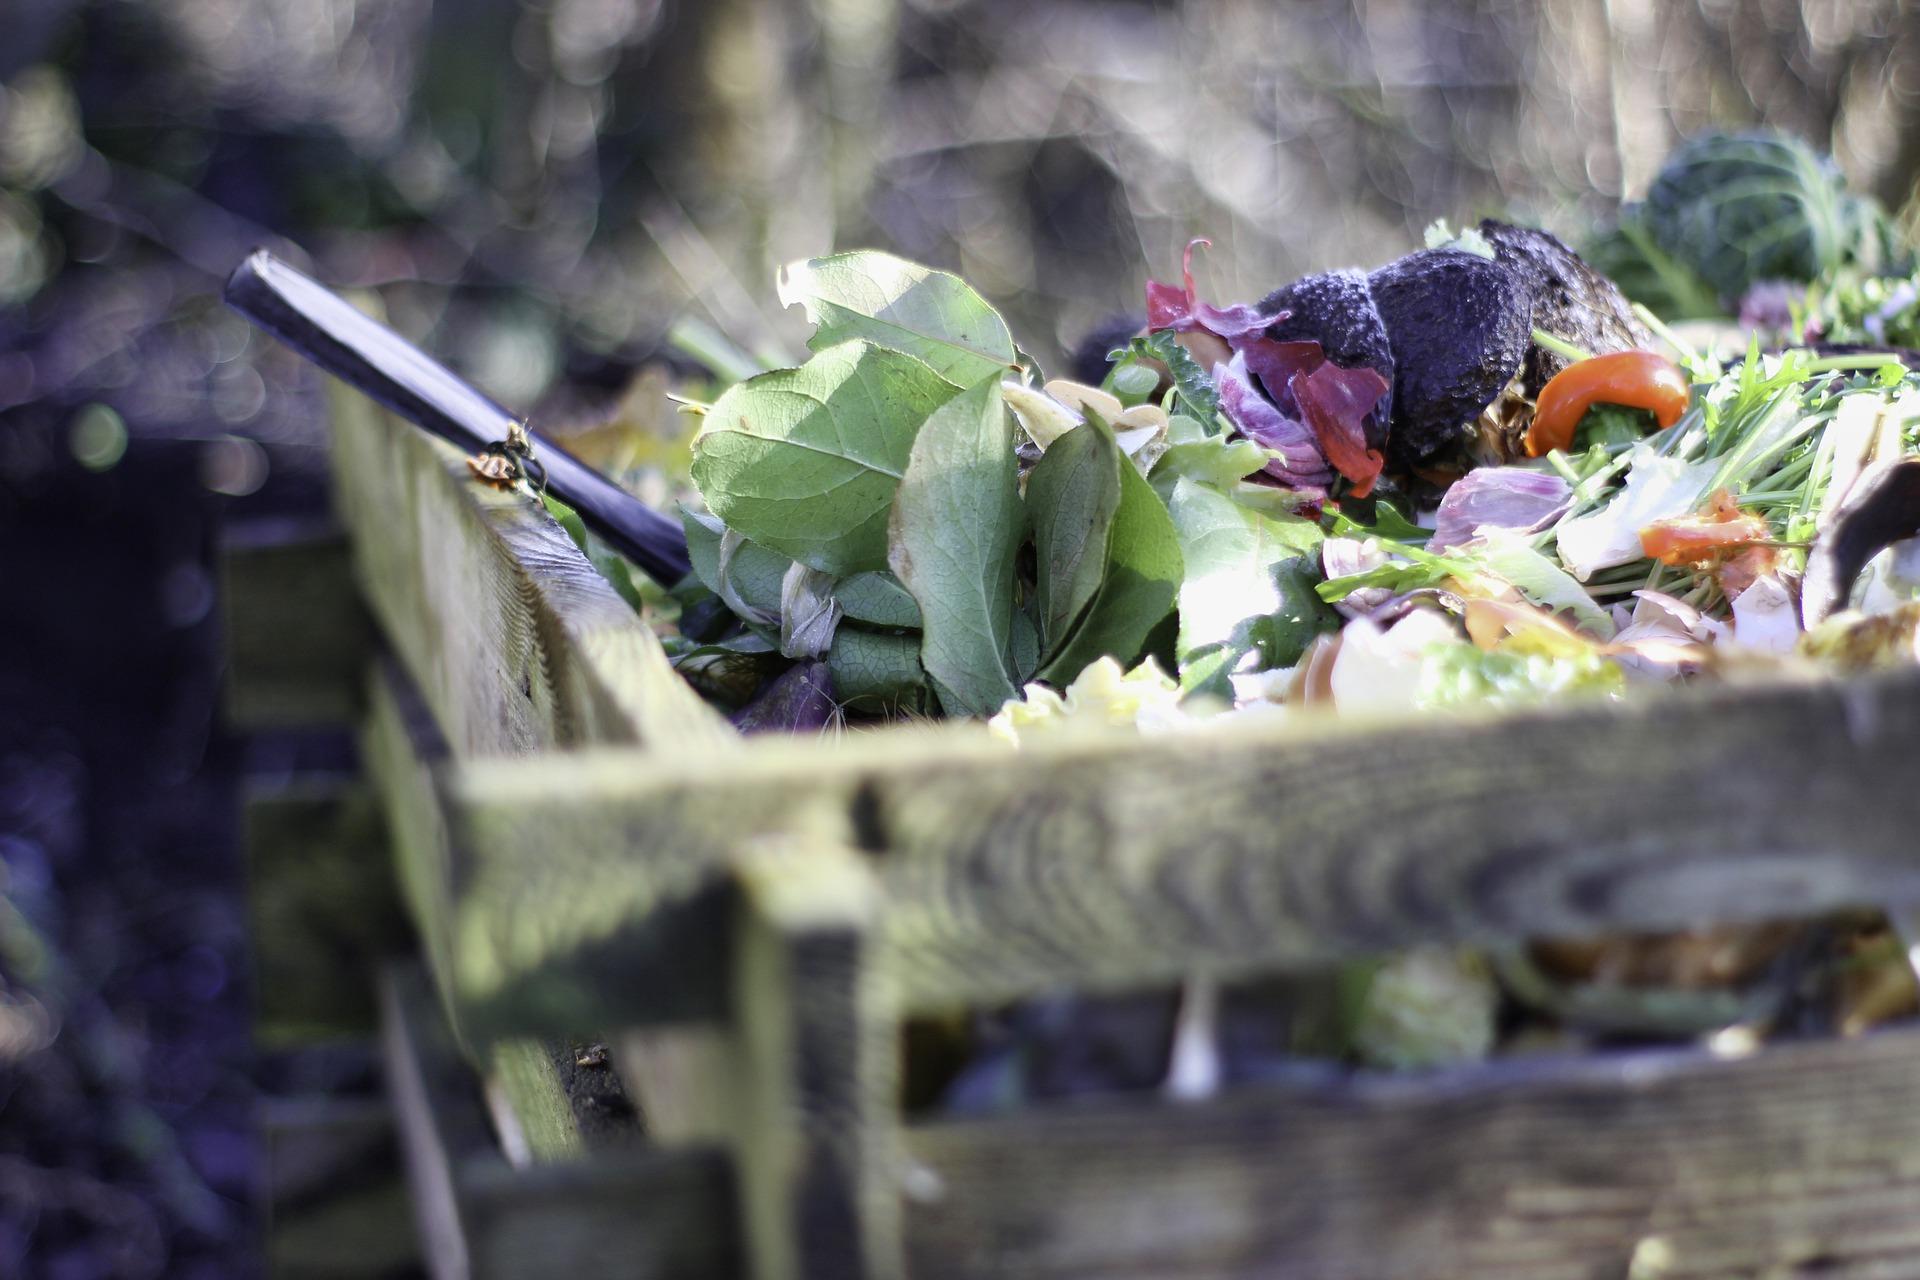 Composting green waste.